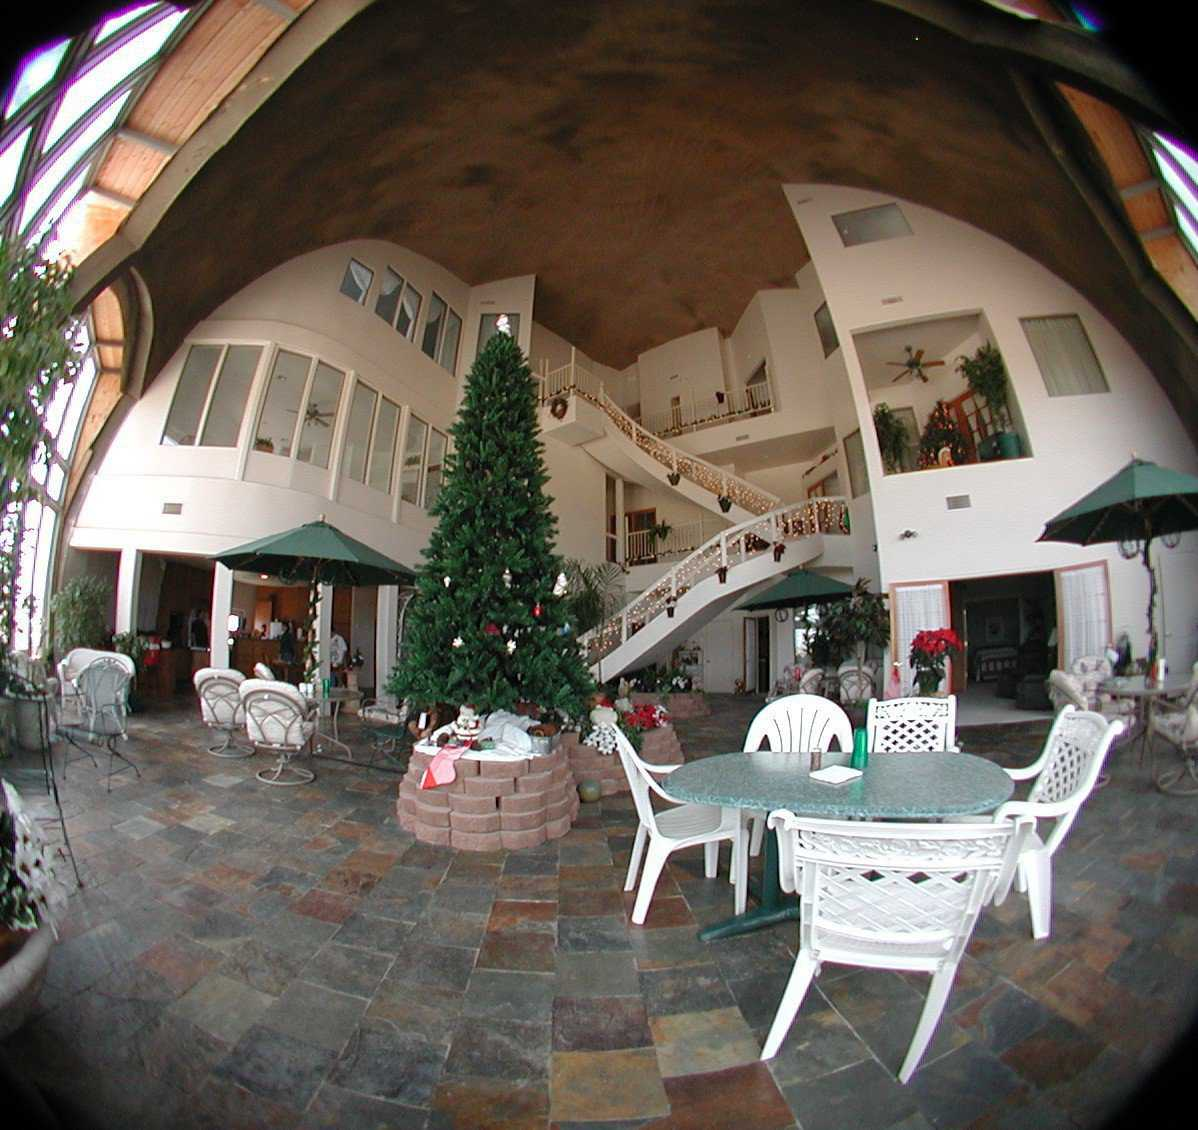 Yumadome  A Multigenerational Monolithic Dome Home